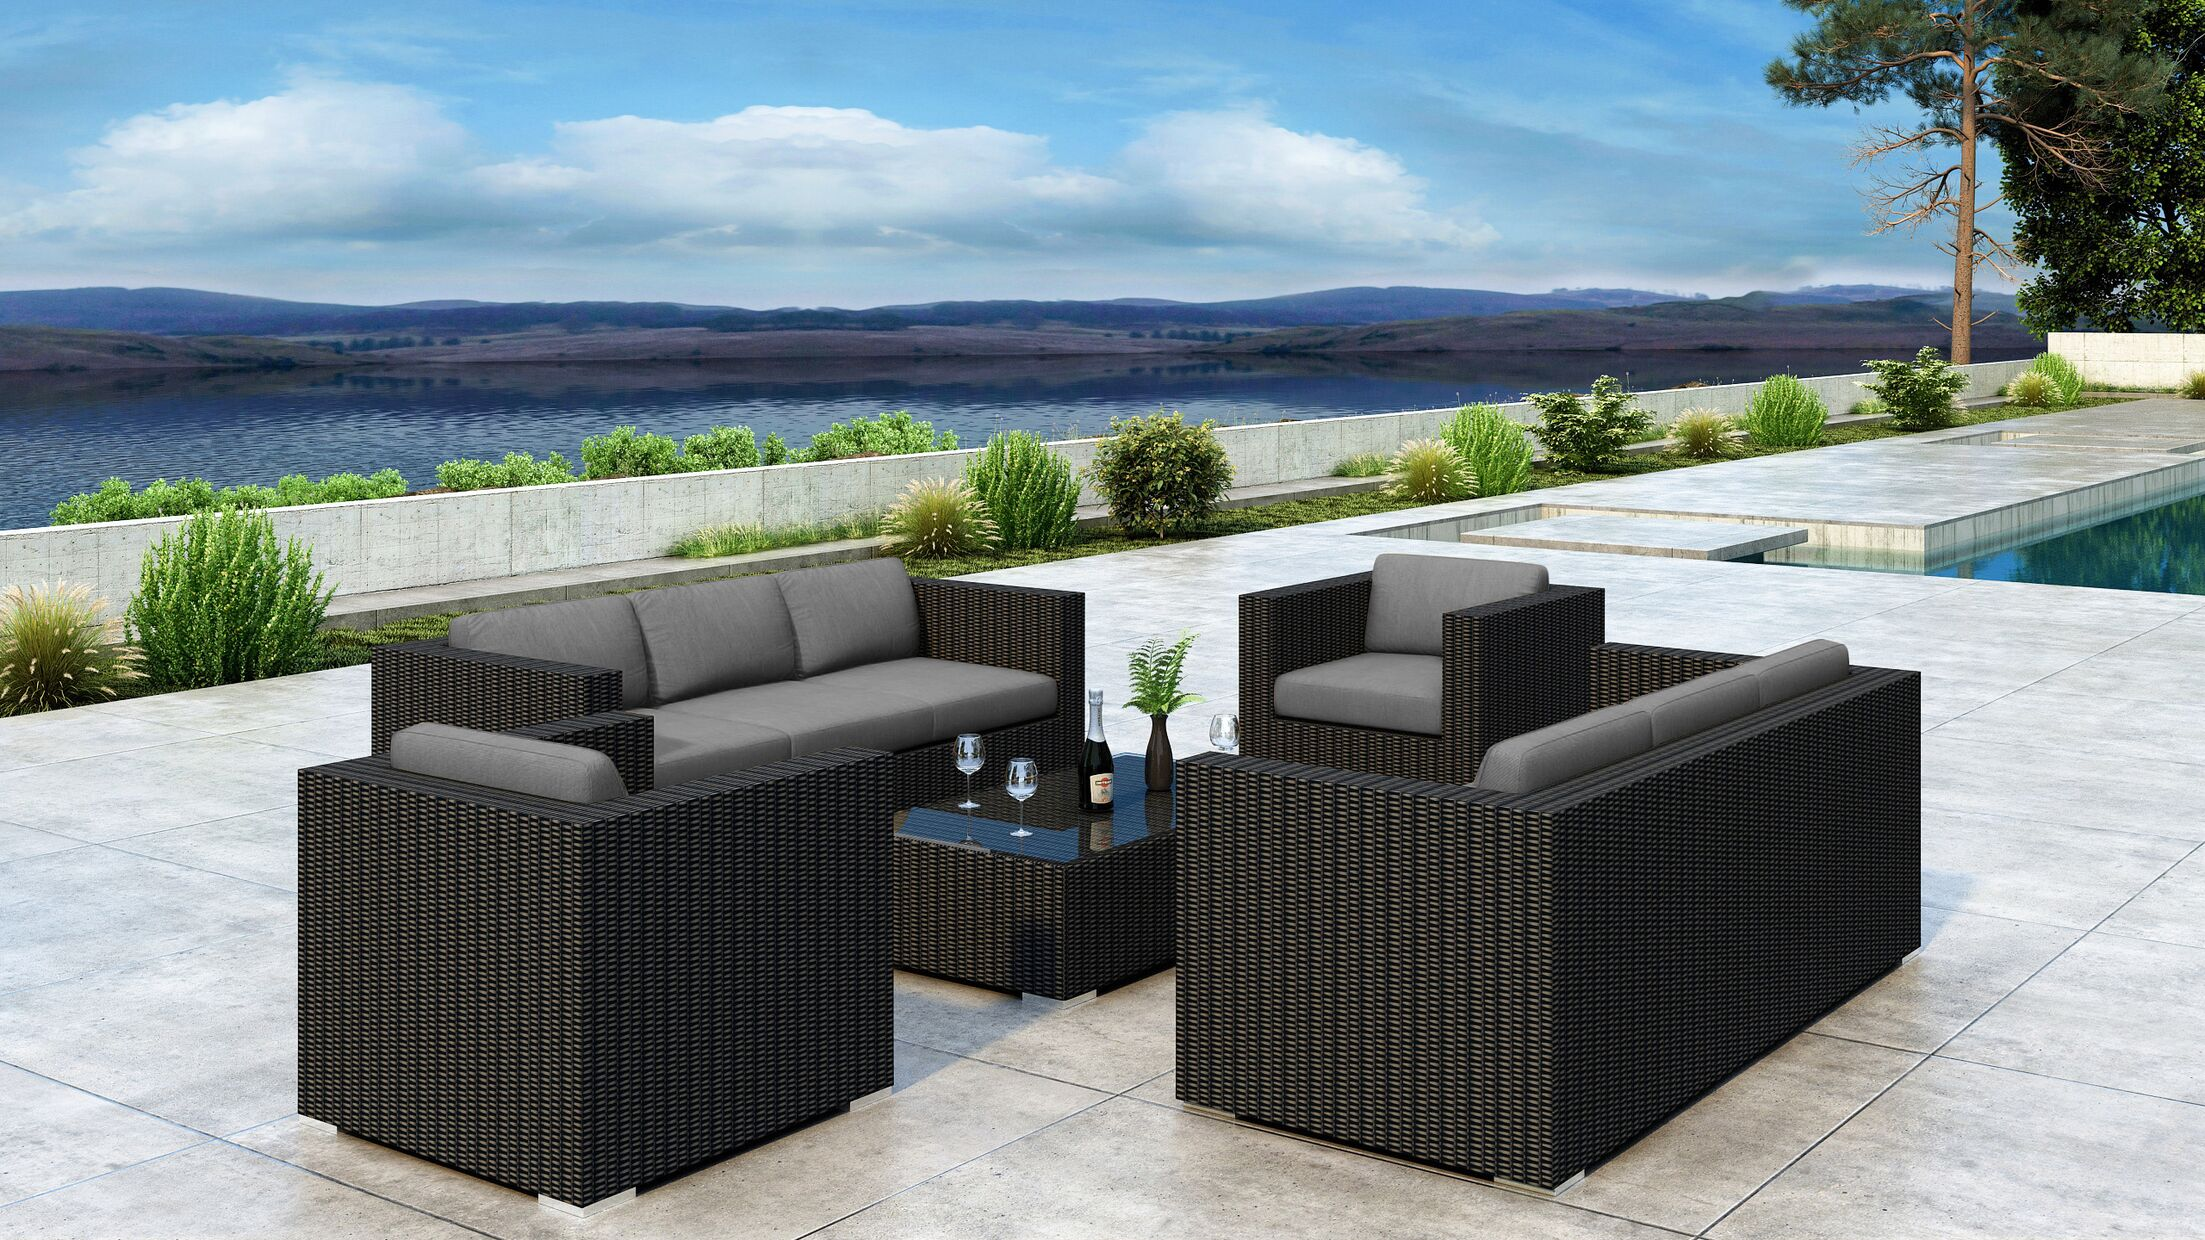 Glendale 5 Piece Sofa Set with Sunbrella Cushion Cushion Color: Canvas Charcoal